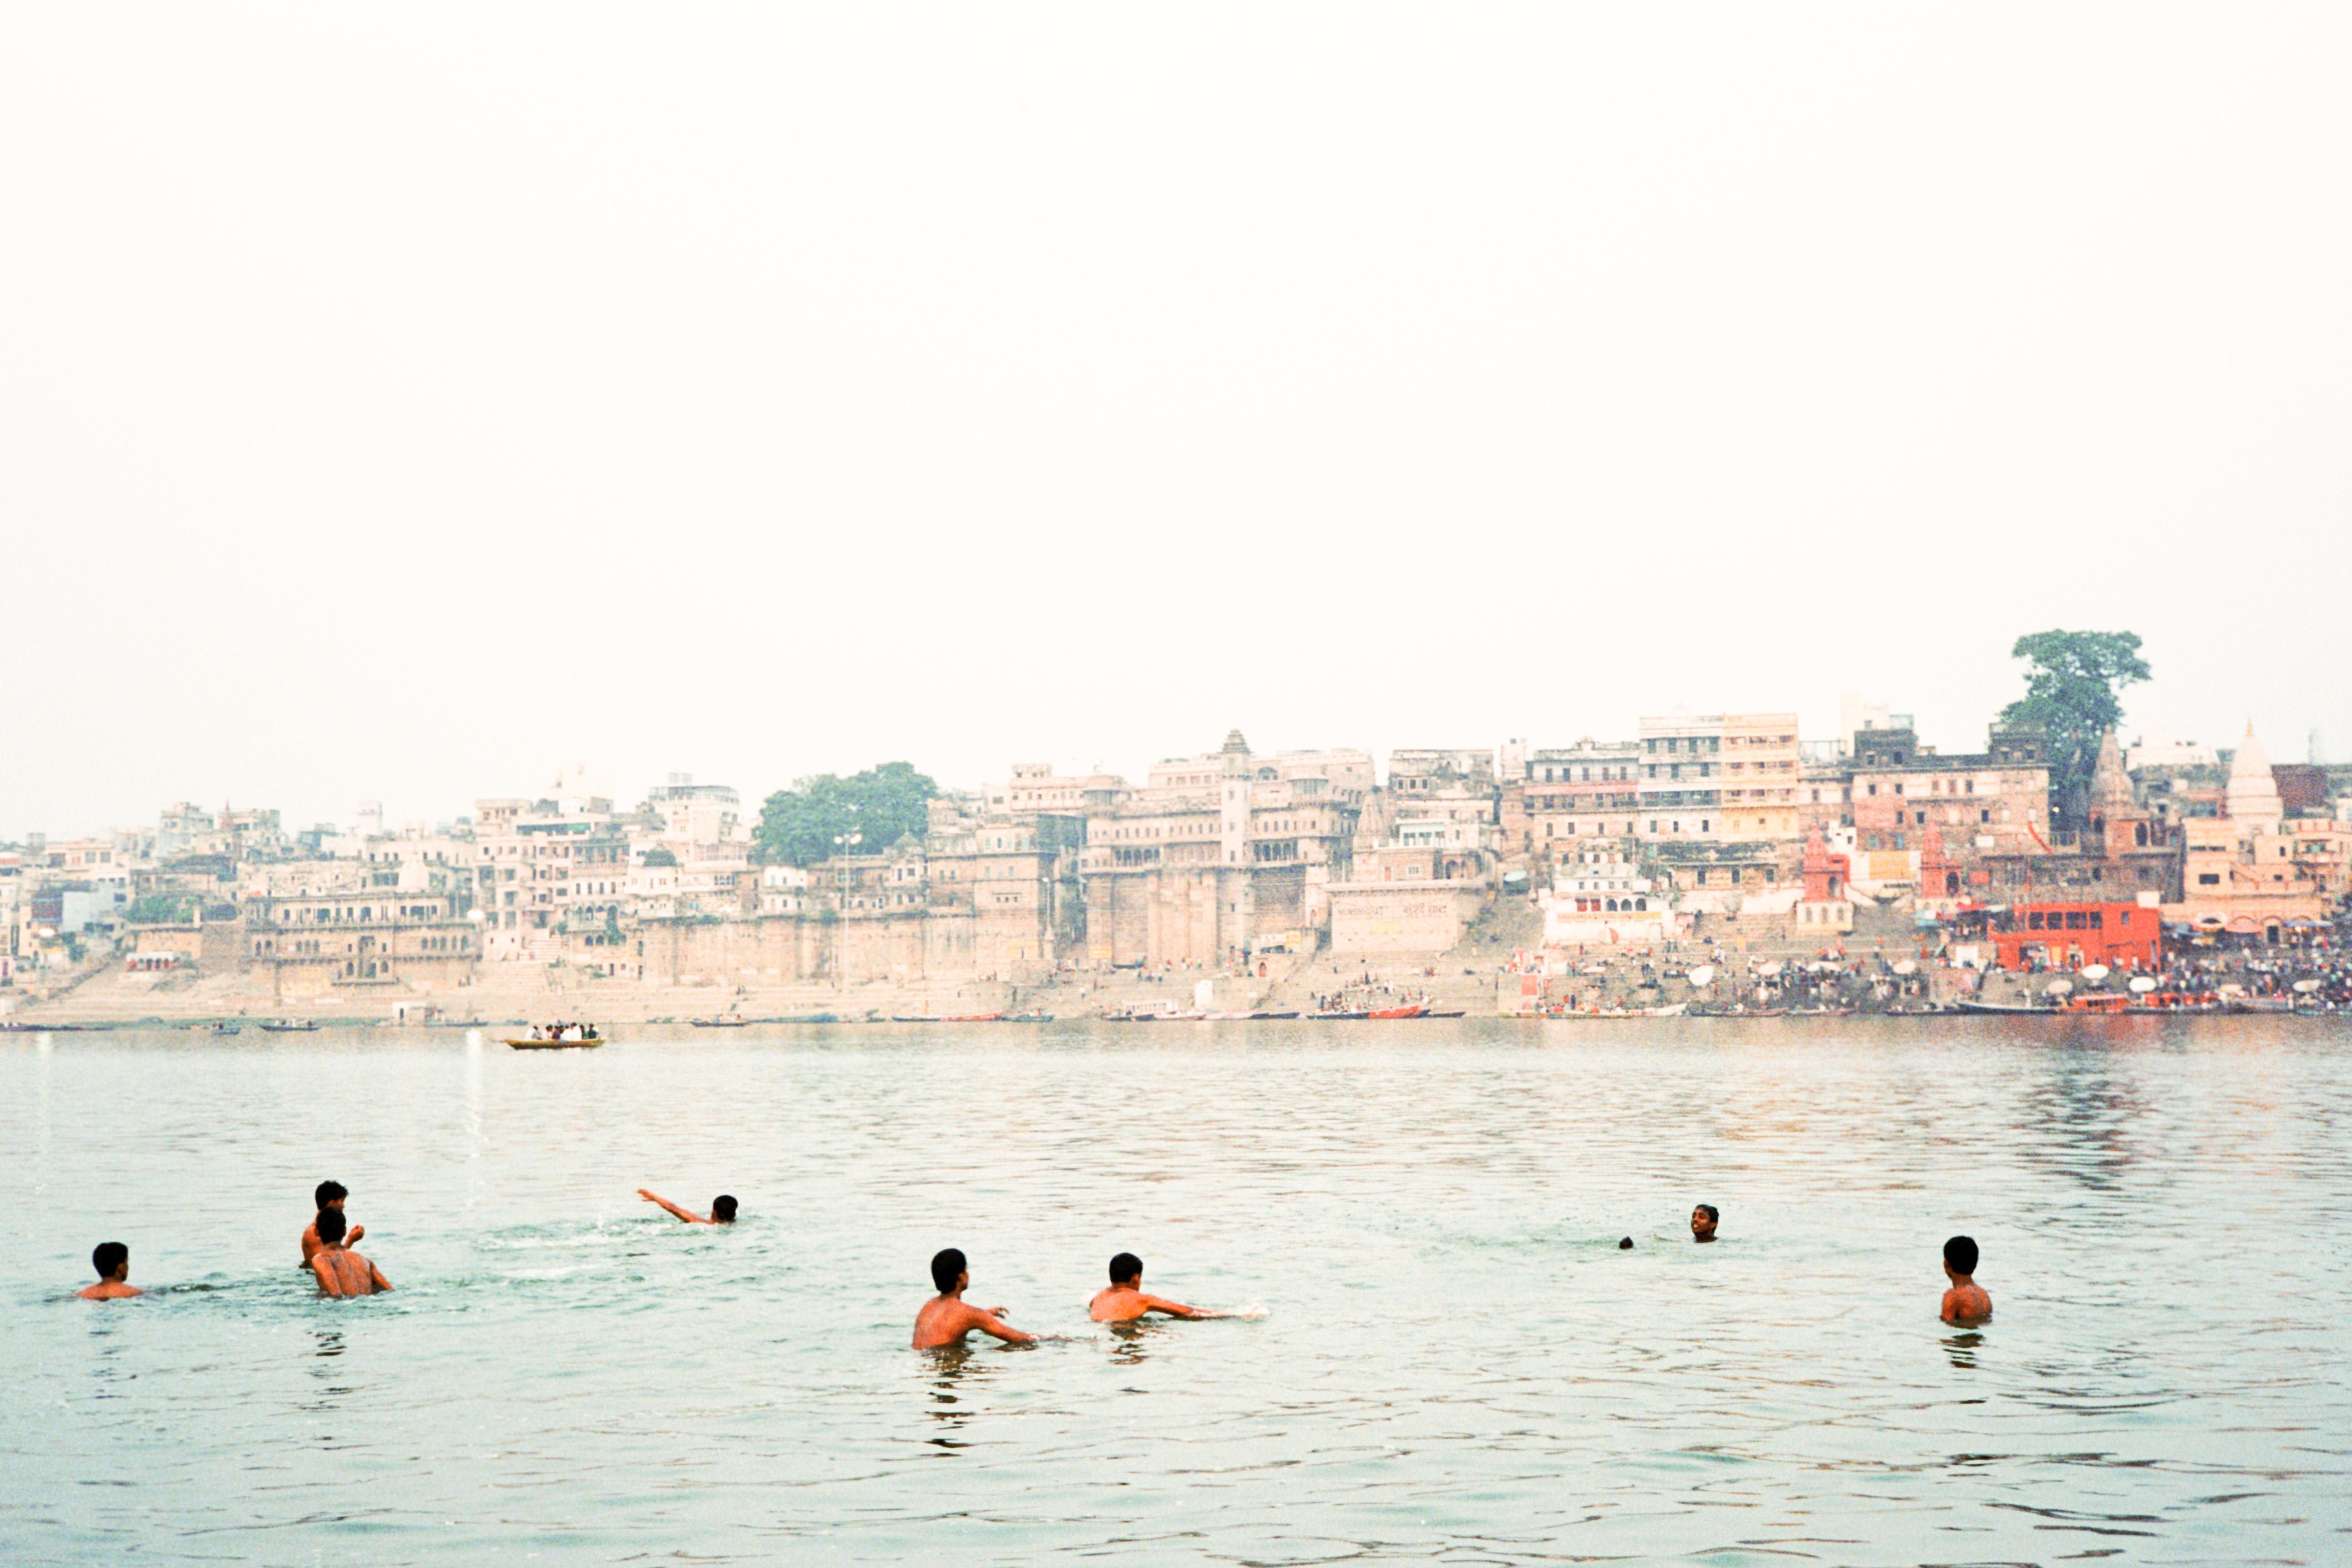 Swimming, Varanasi, India, , fine art photography, shooting film, landscape, Incredible india, fine art, art , artist, workshop, pilgrims, holy city, travel